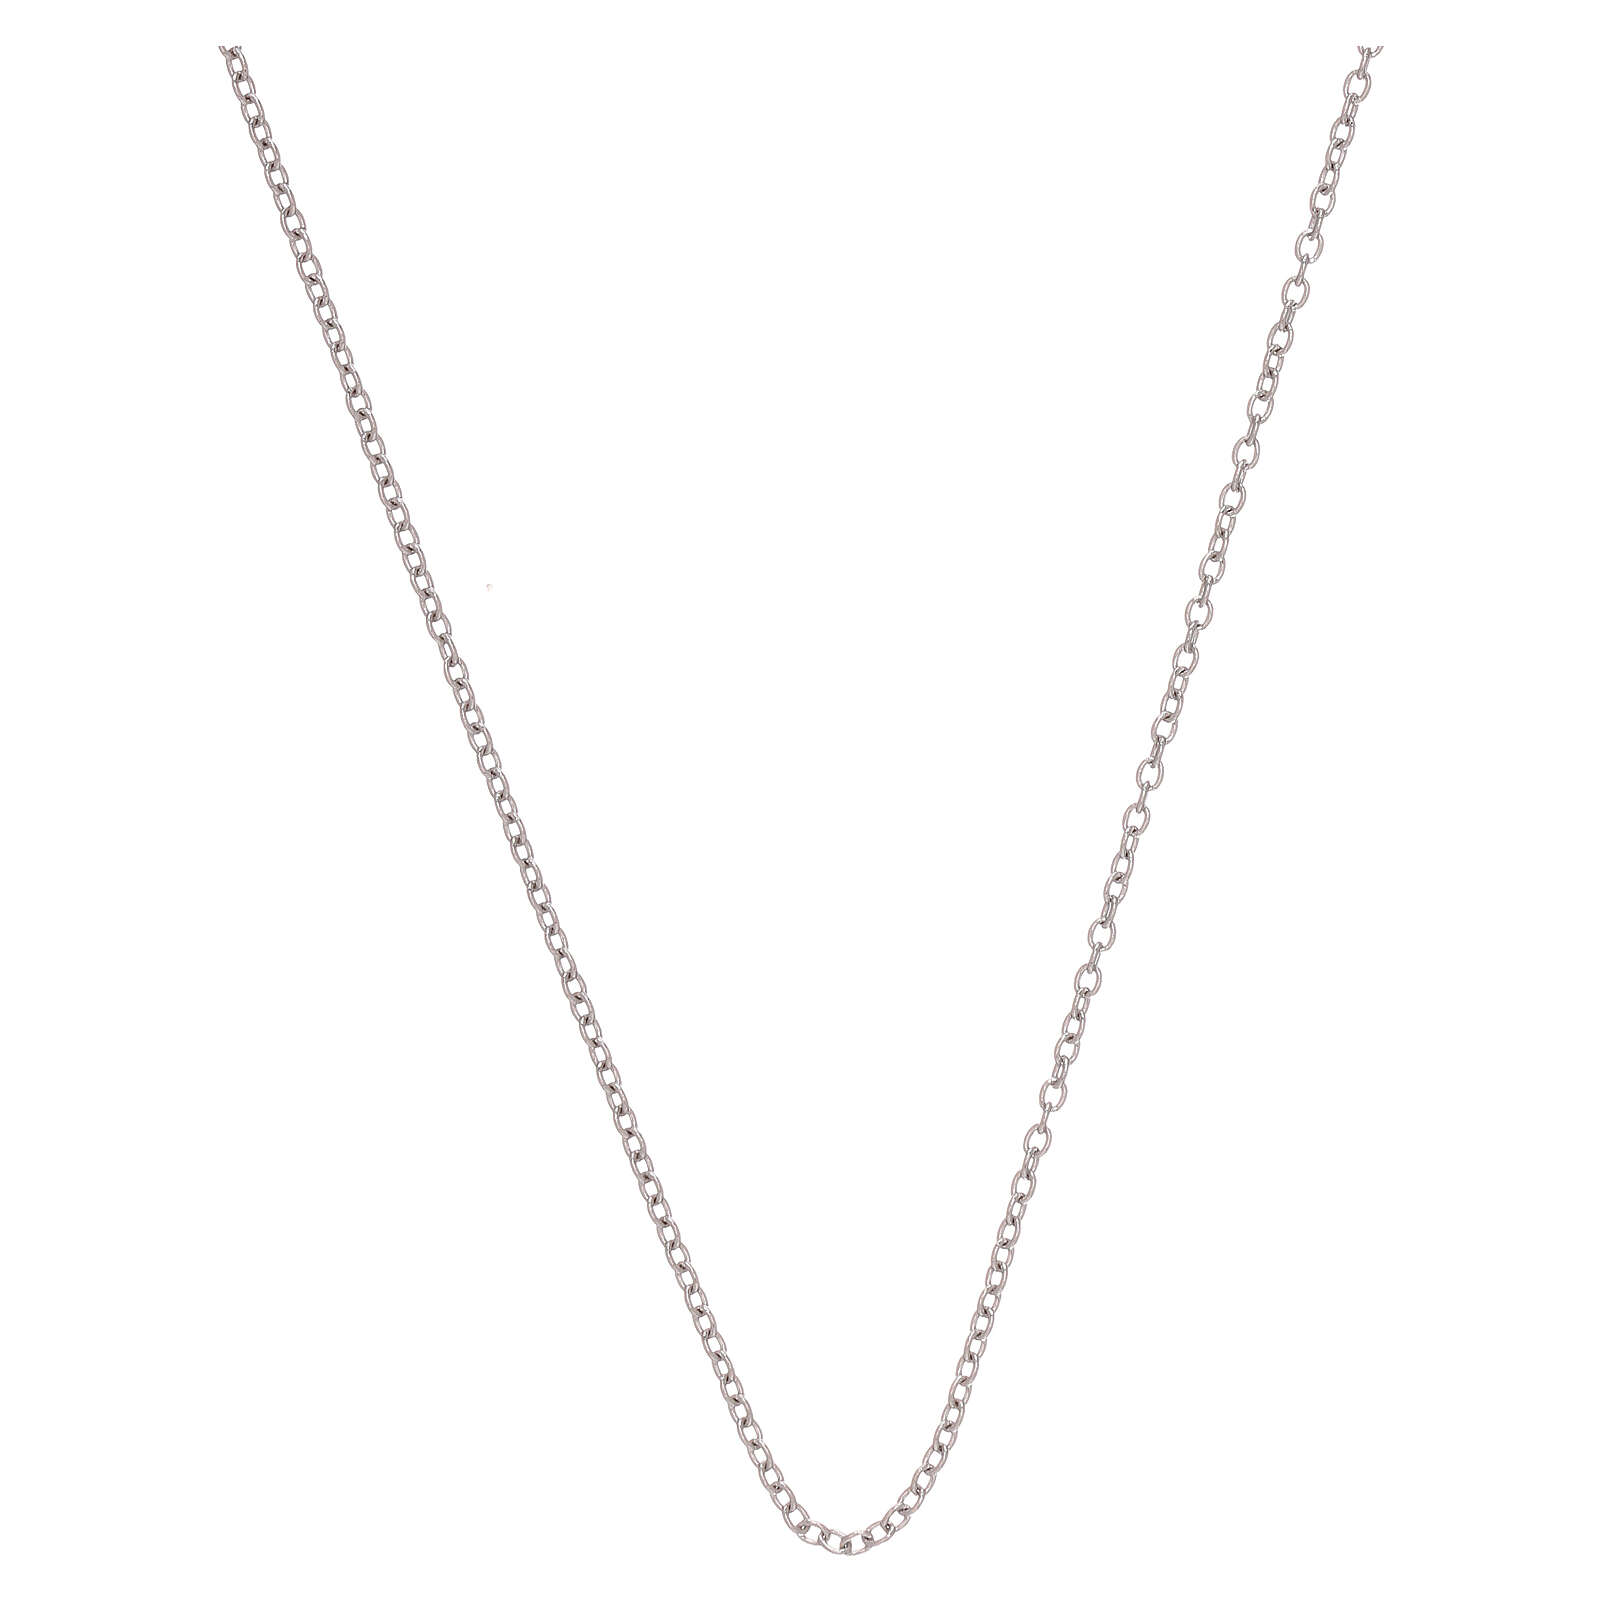 Rolo chain 750/00 white gold 19 3/4 in 4